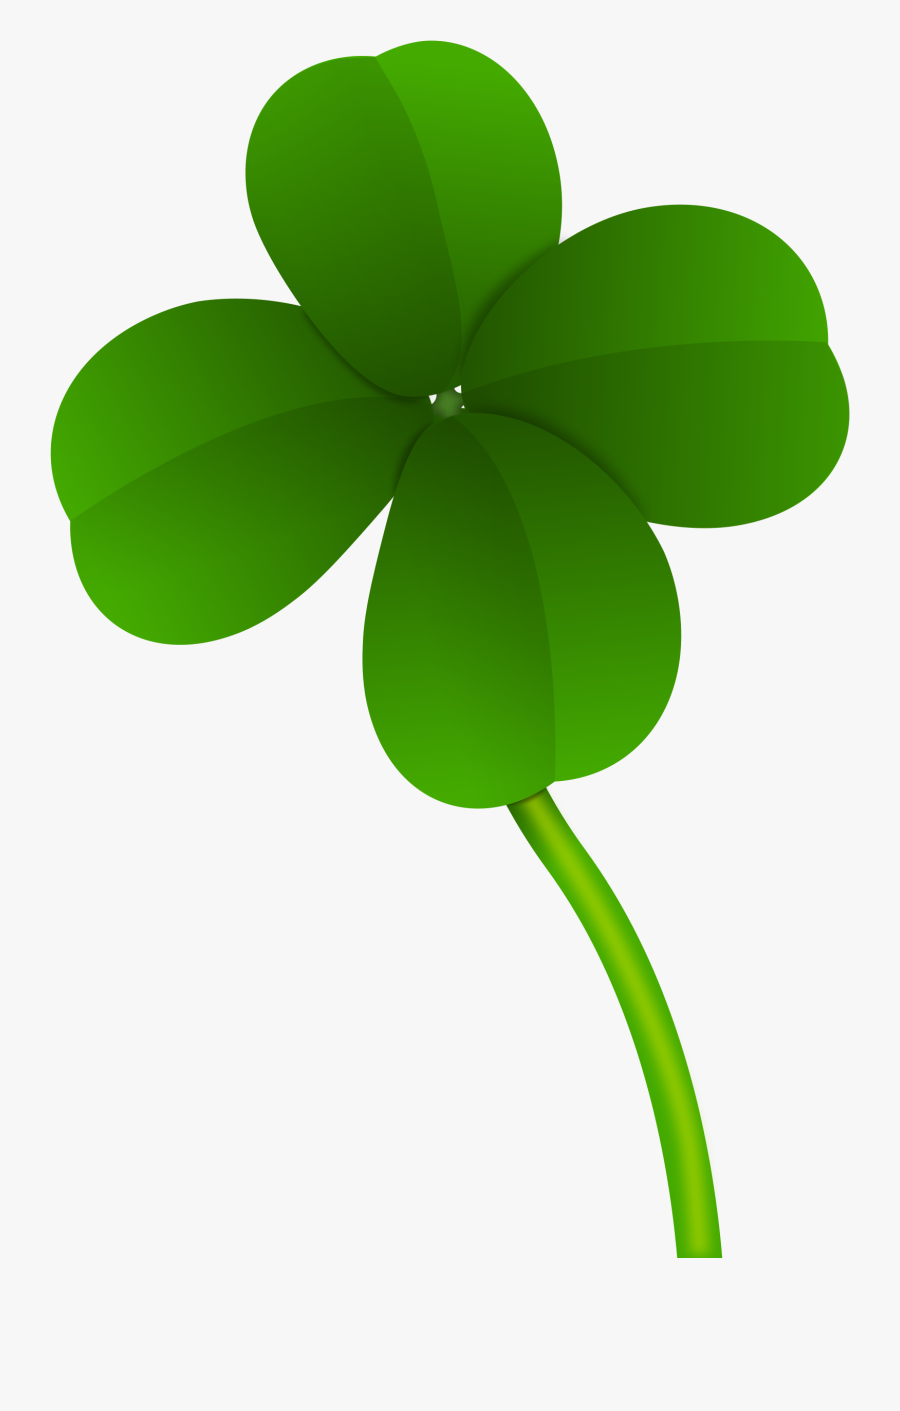 Clover Png Images Transparent Free Download - Four Leaf Clover Clear Background, Transparent Clipart